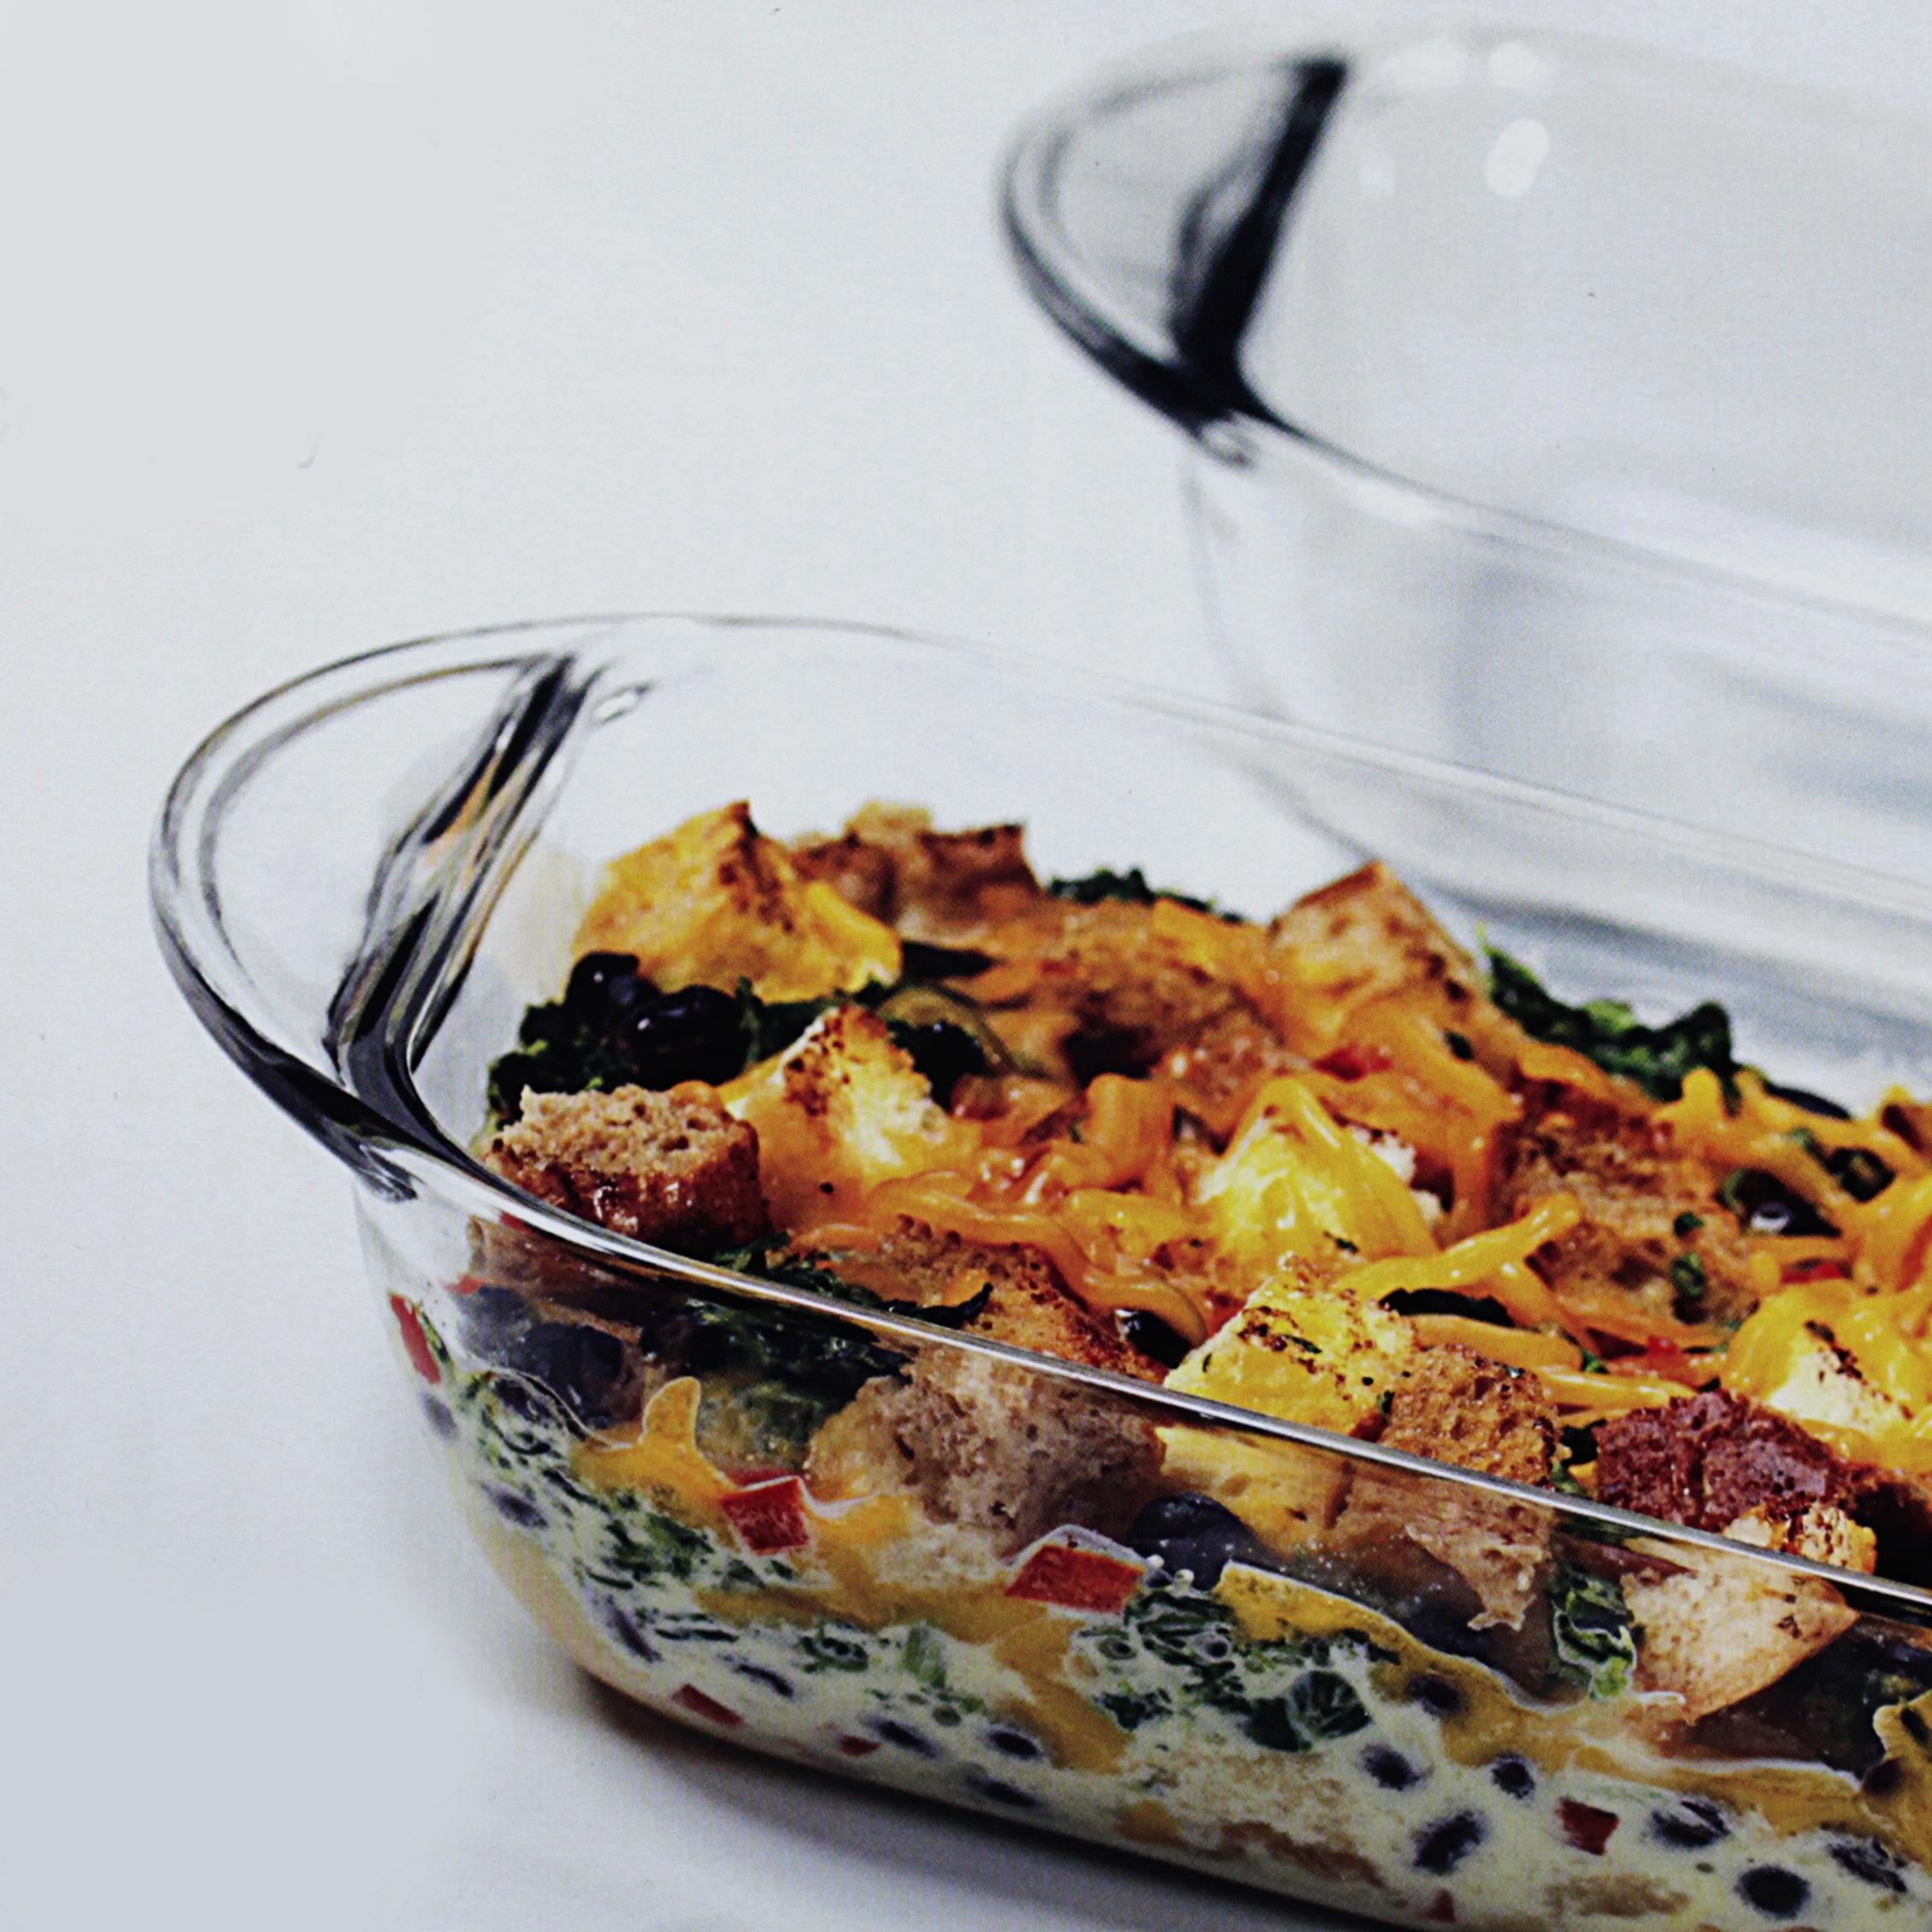 Anchor Hocking Oven Basics 1 Quart Mini Glass Bake Dish, Set of 2